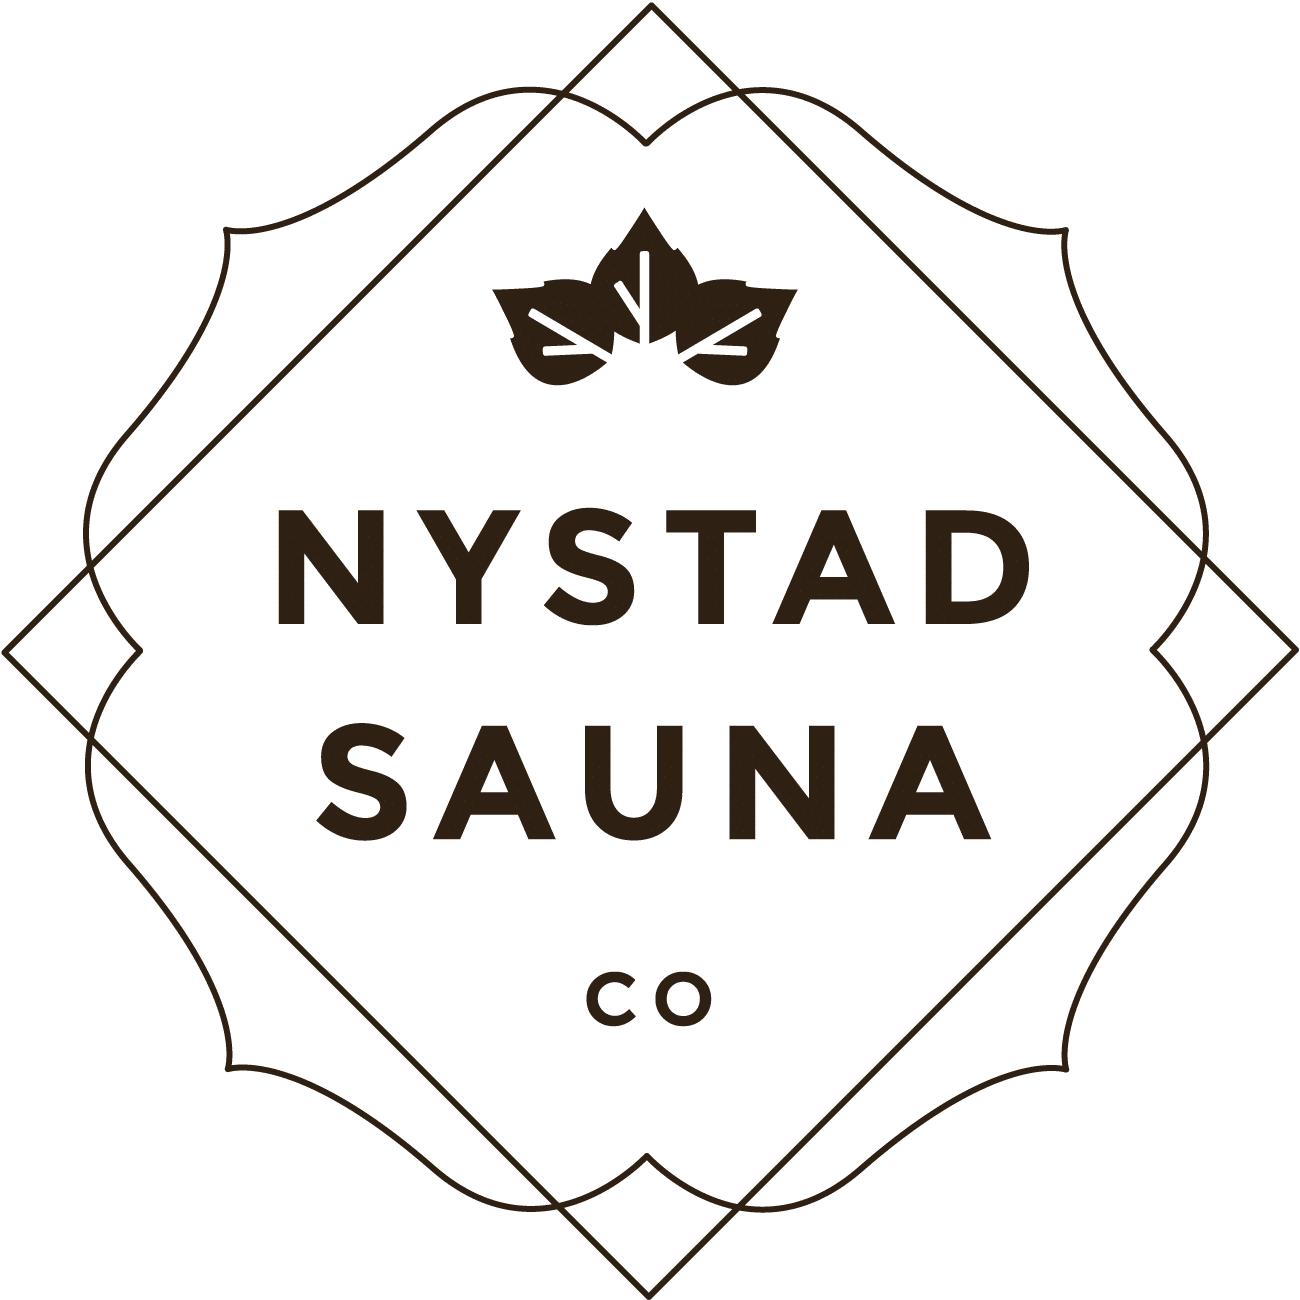 Nystad Sauna Company